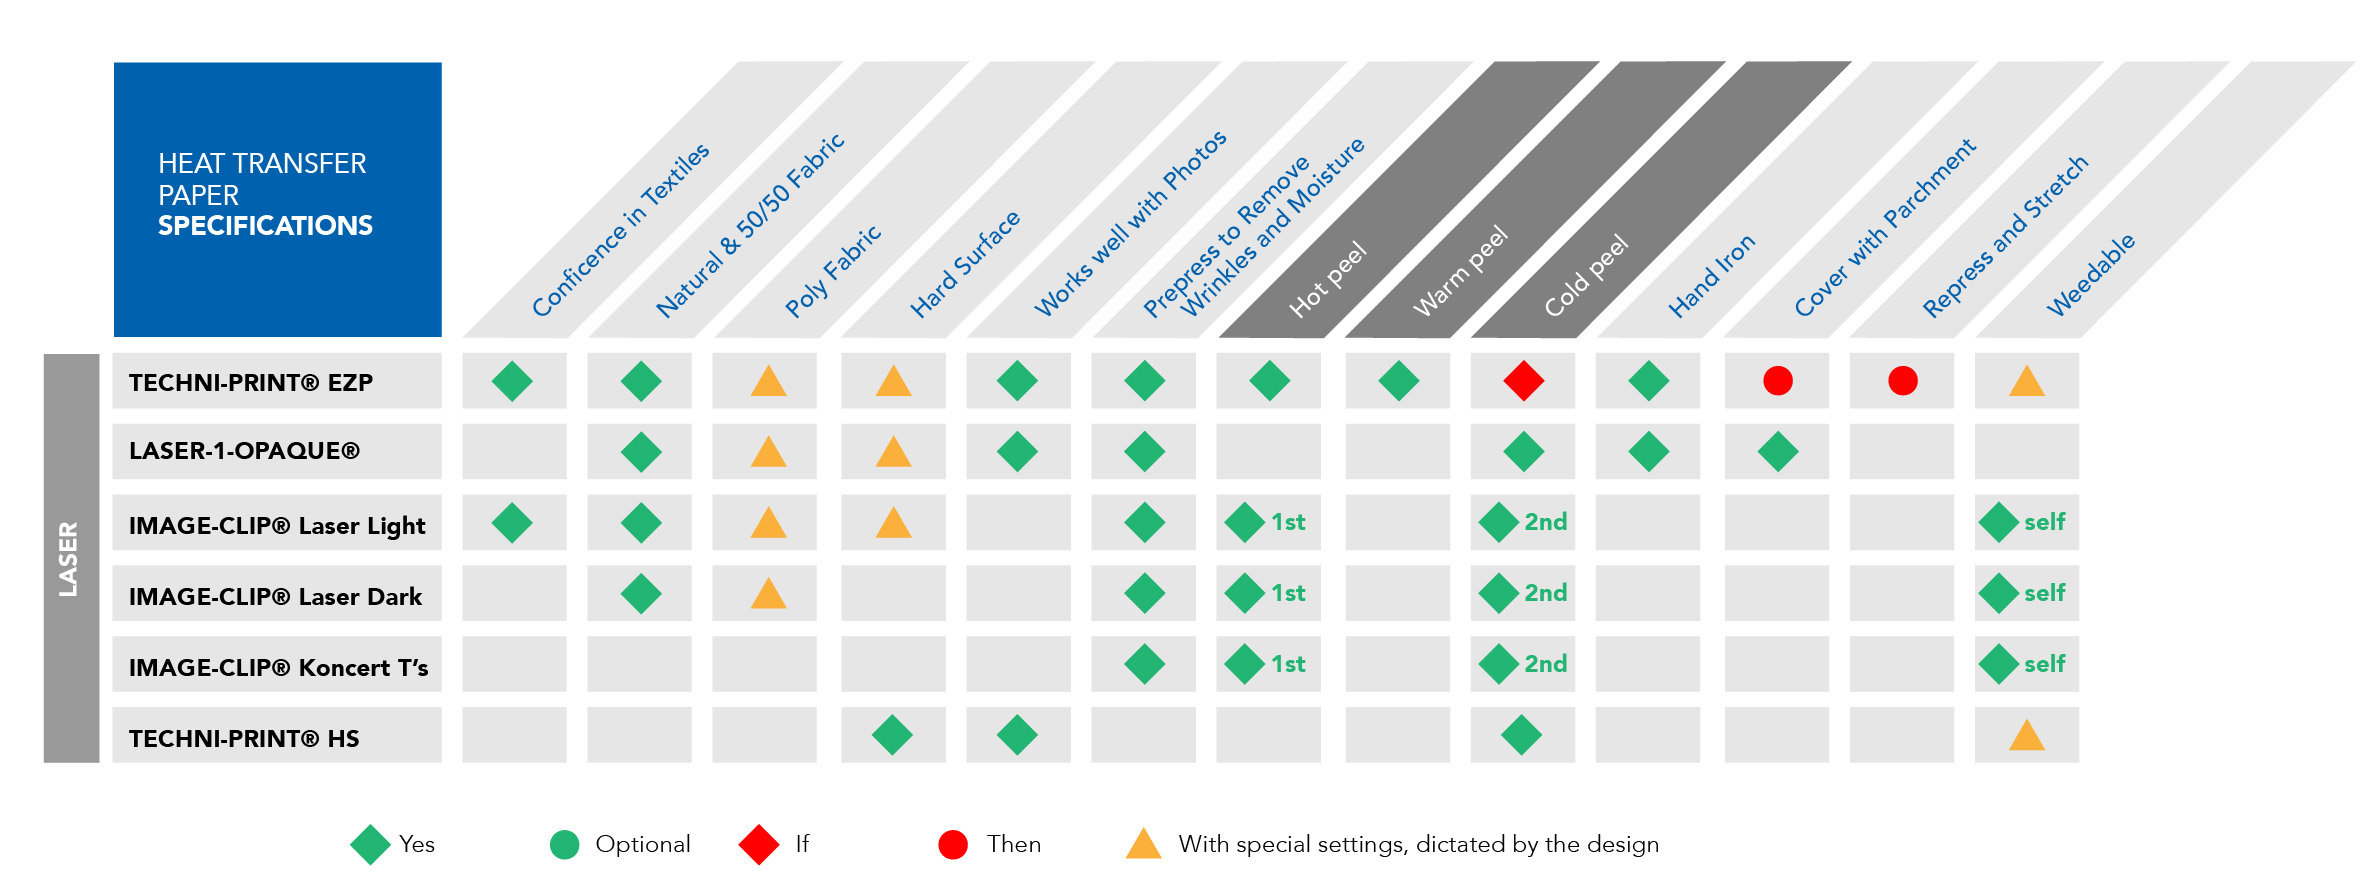 tpc-neenah-laser-paper-comparison-chart-specs.jpg